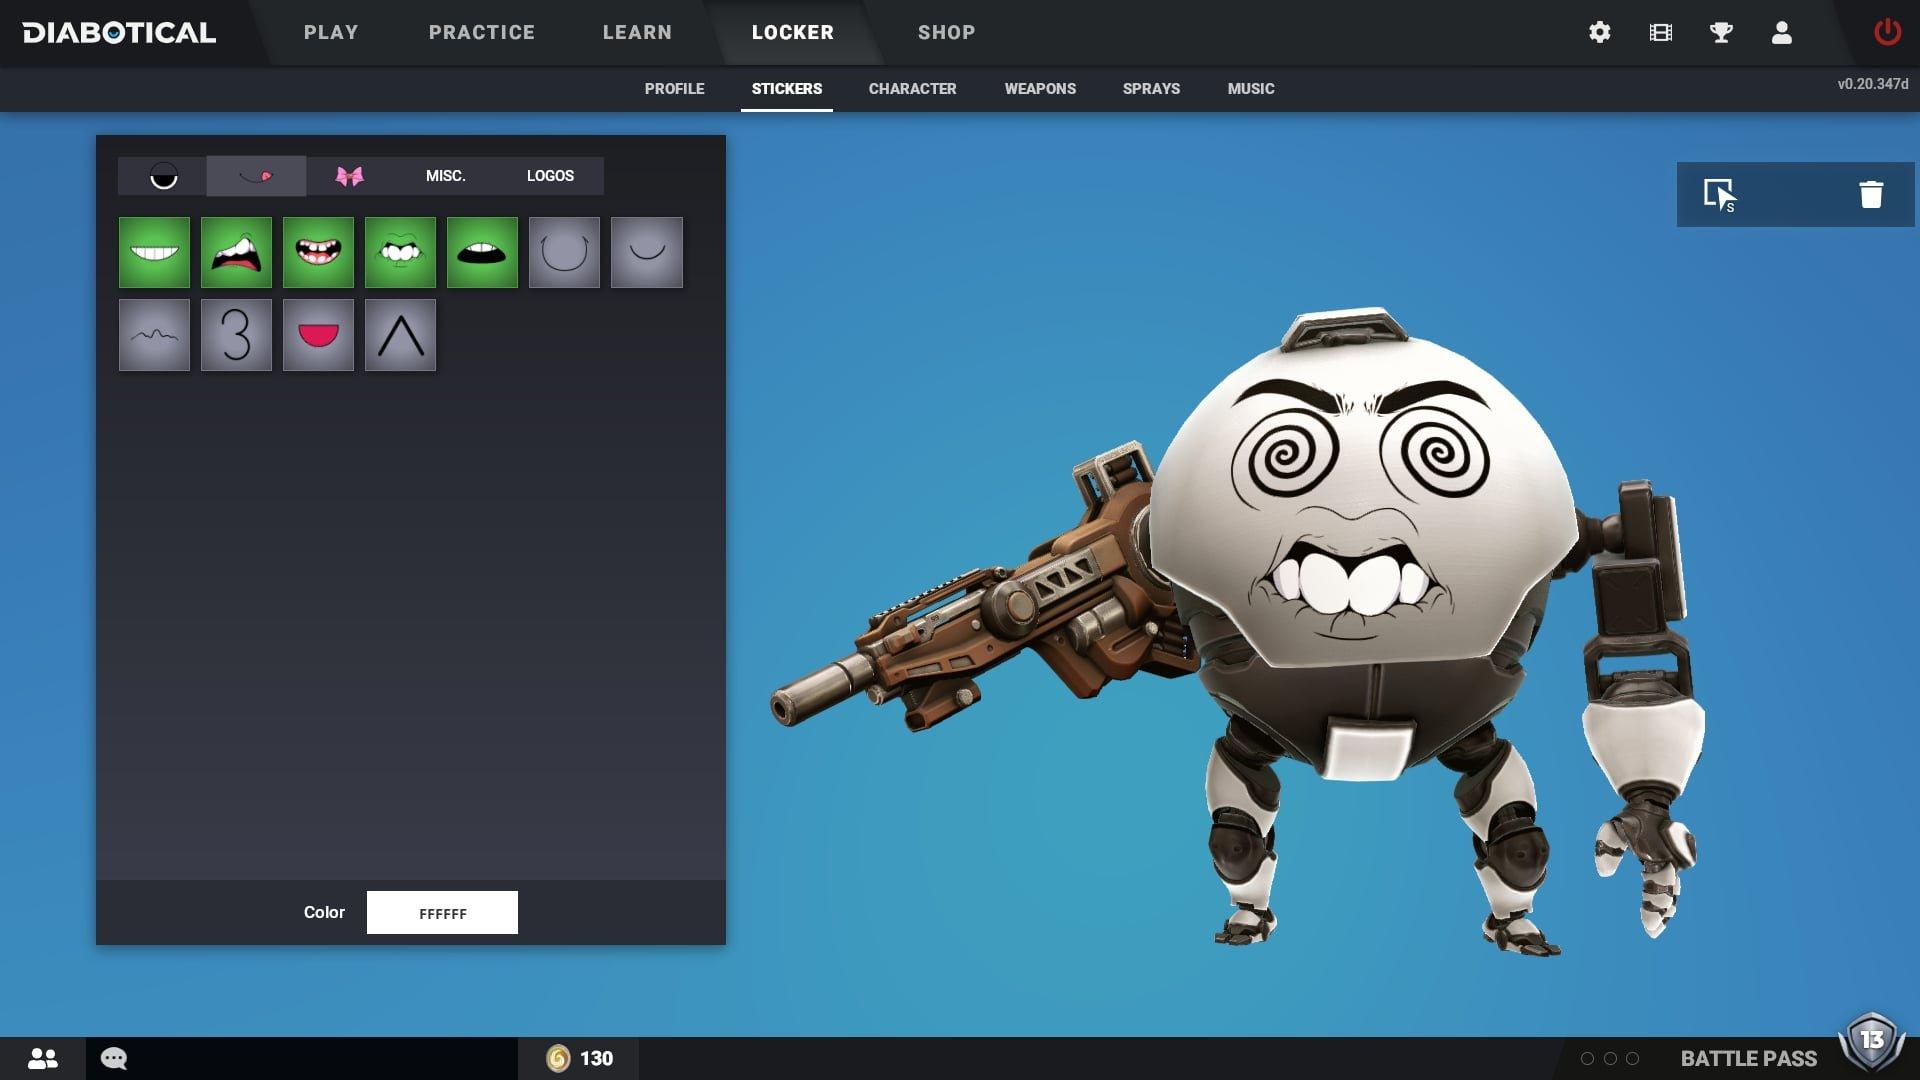 Diabotical Gameplay Character Creator Eggbot